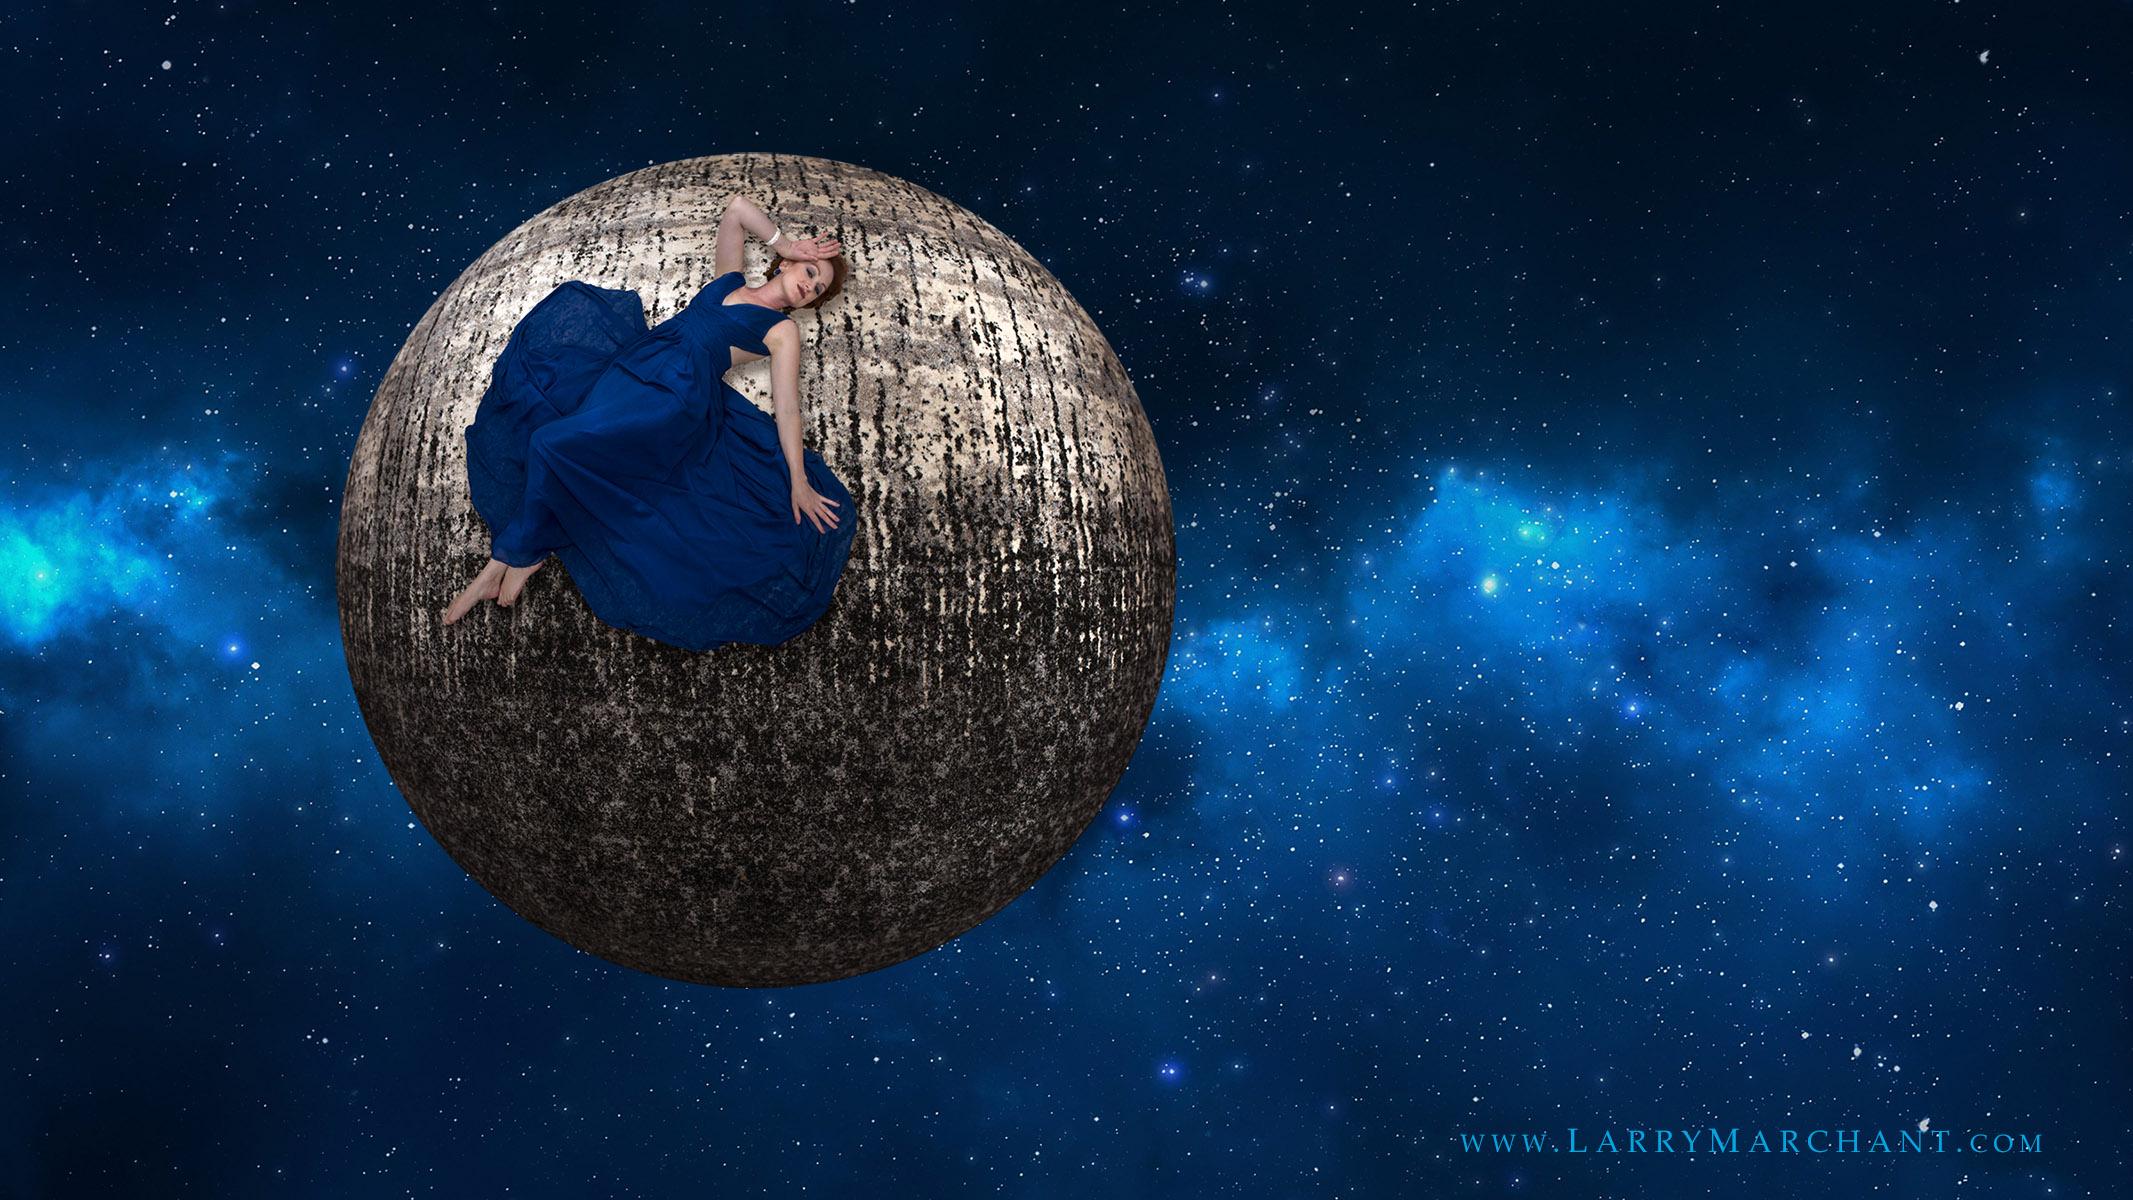 Deb Moon